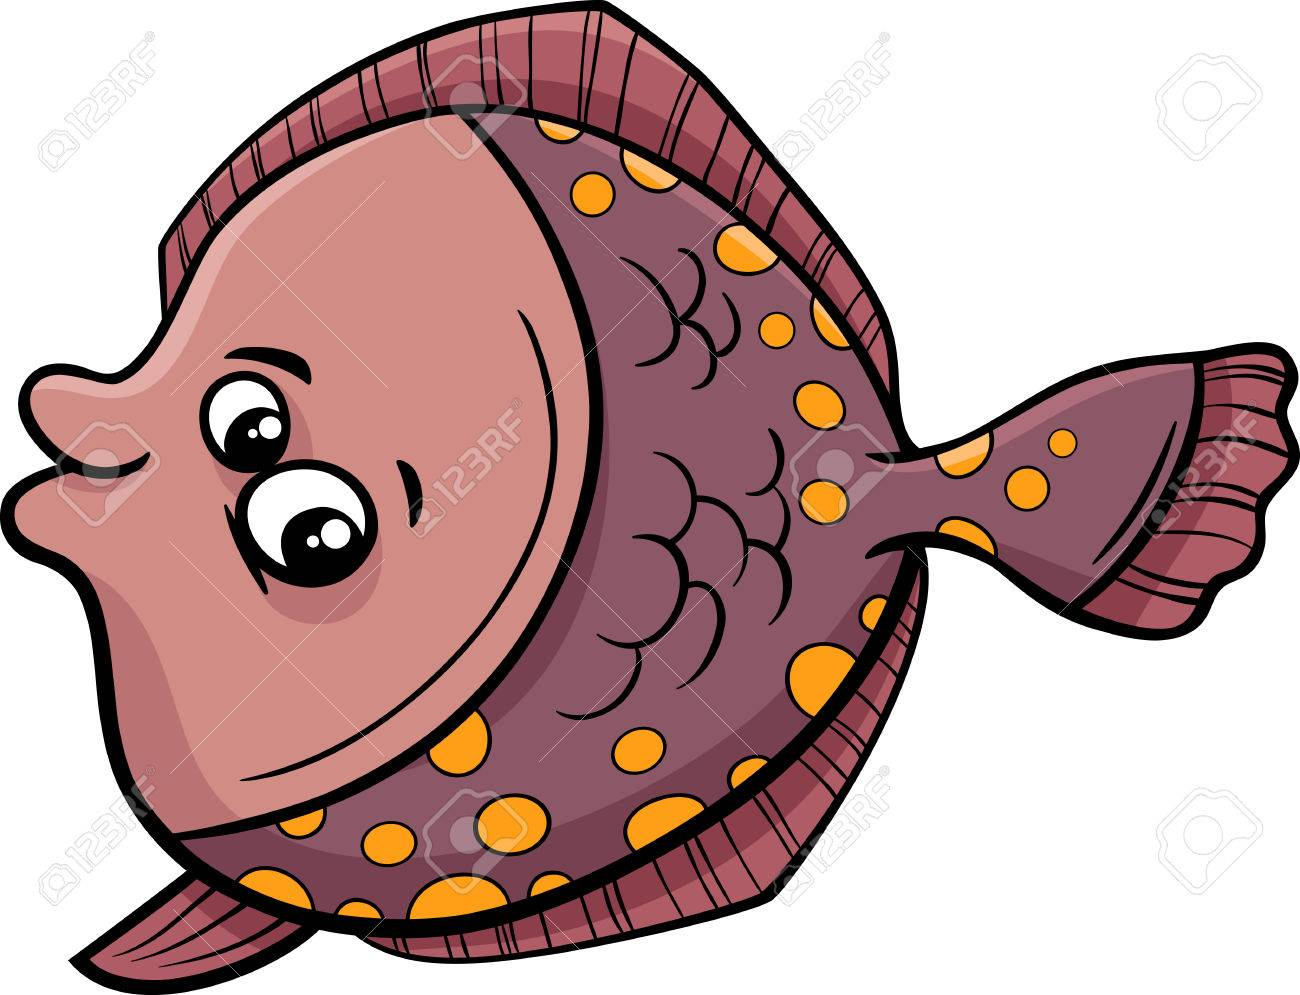 Cartoon Illustration of Funny Flounder Fish Sea Life Animal.